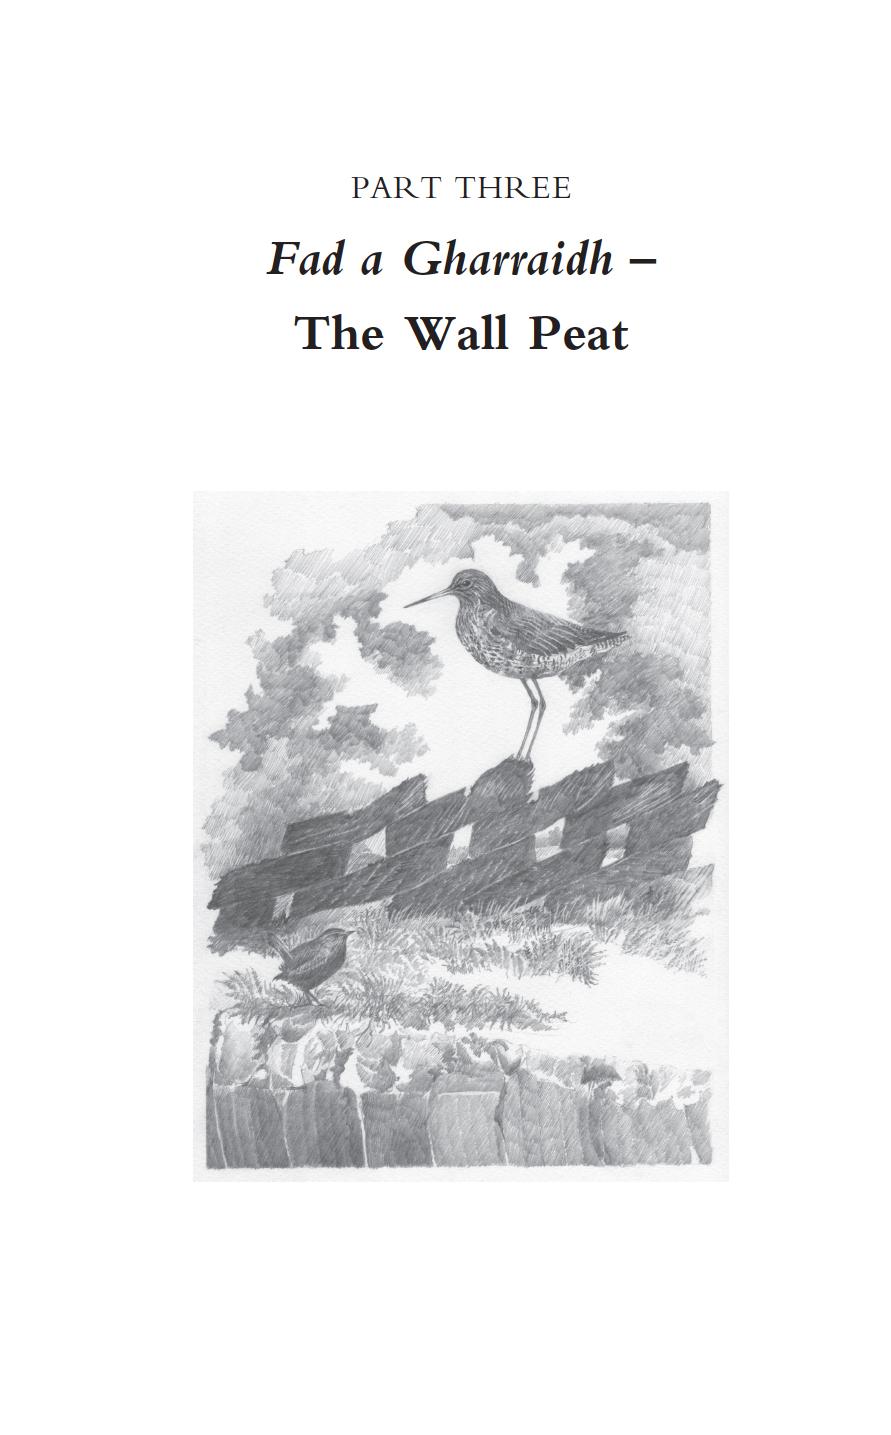 wall peat book.jpg